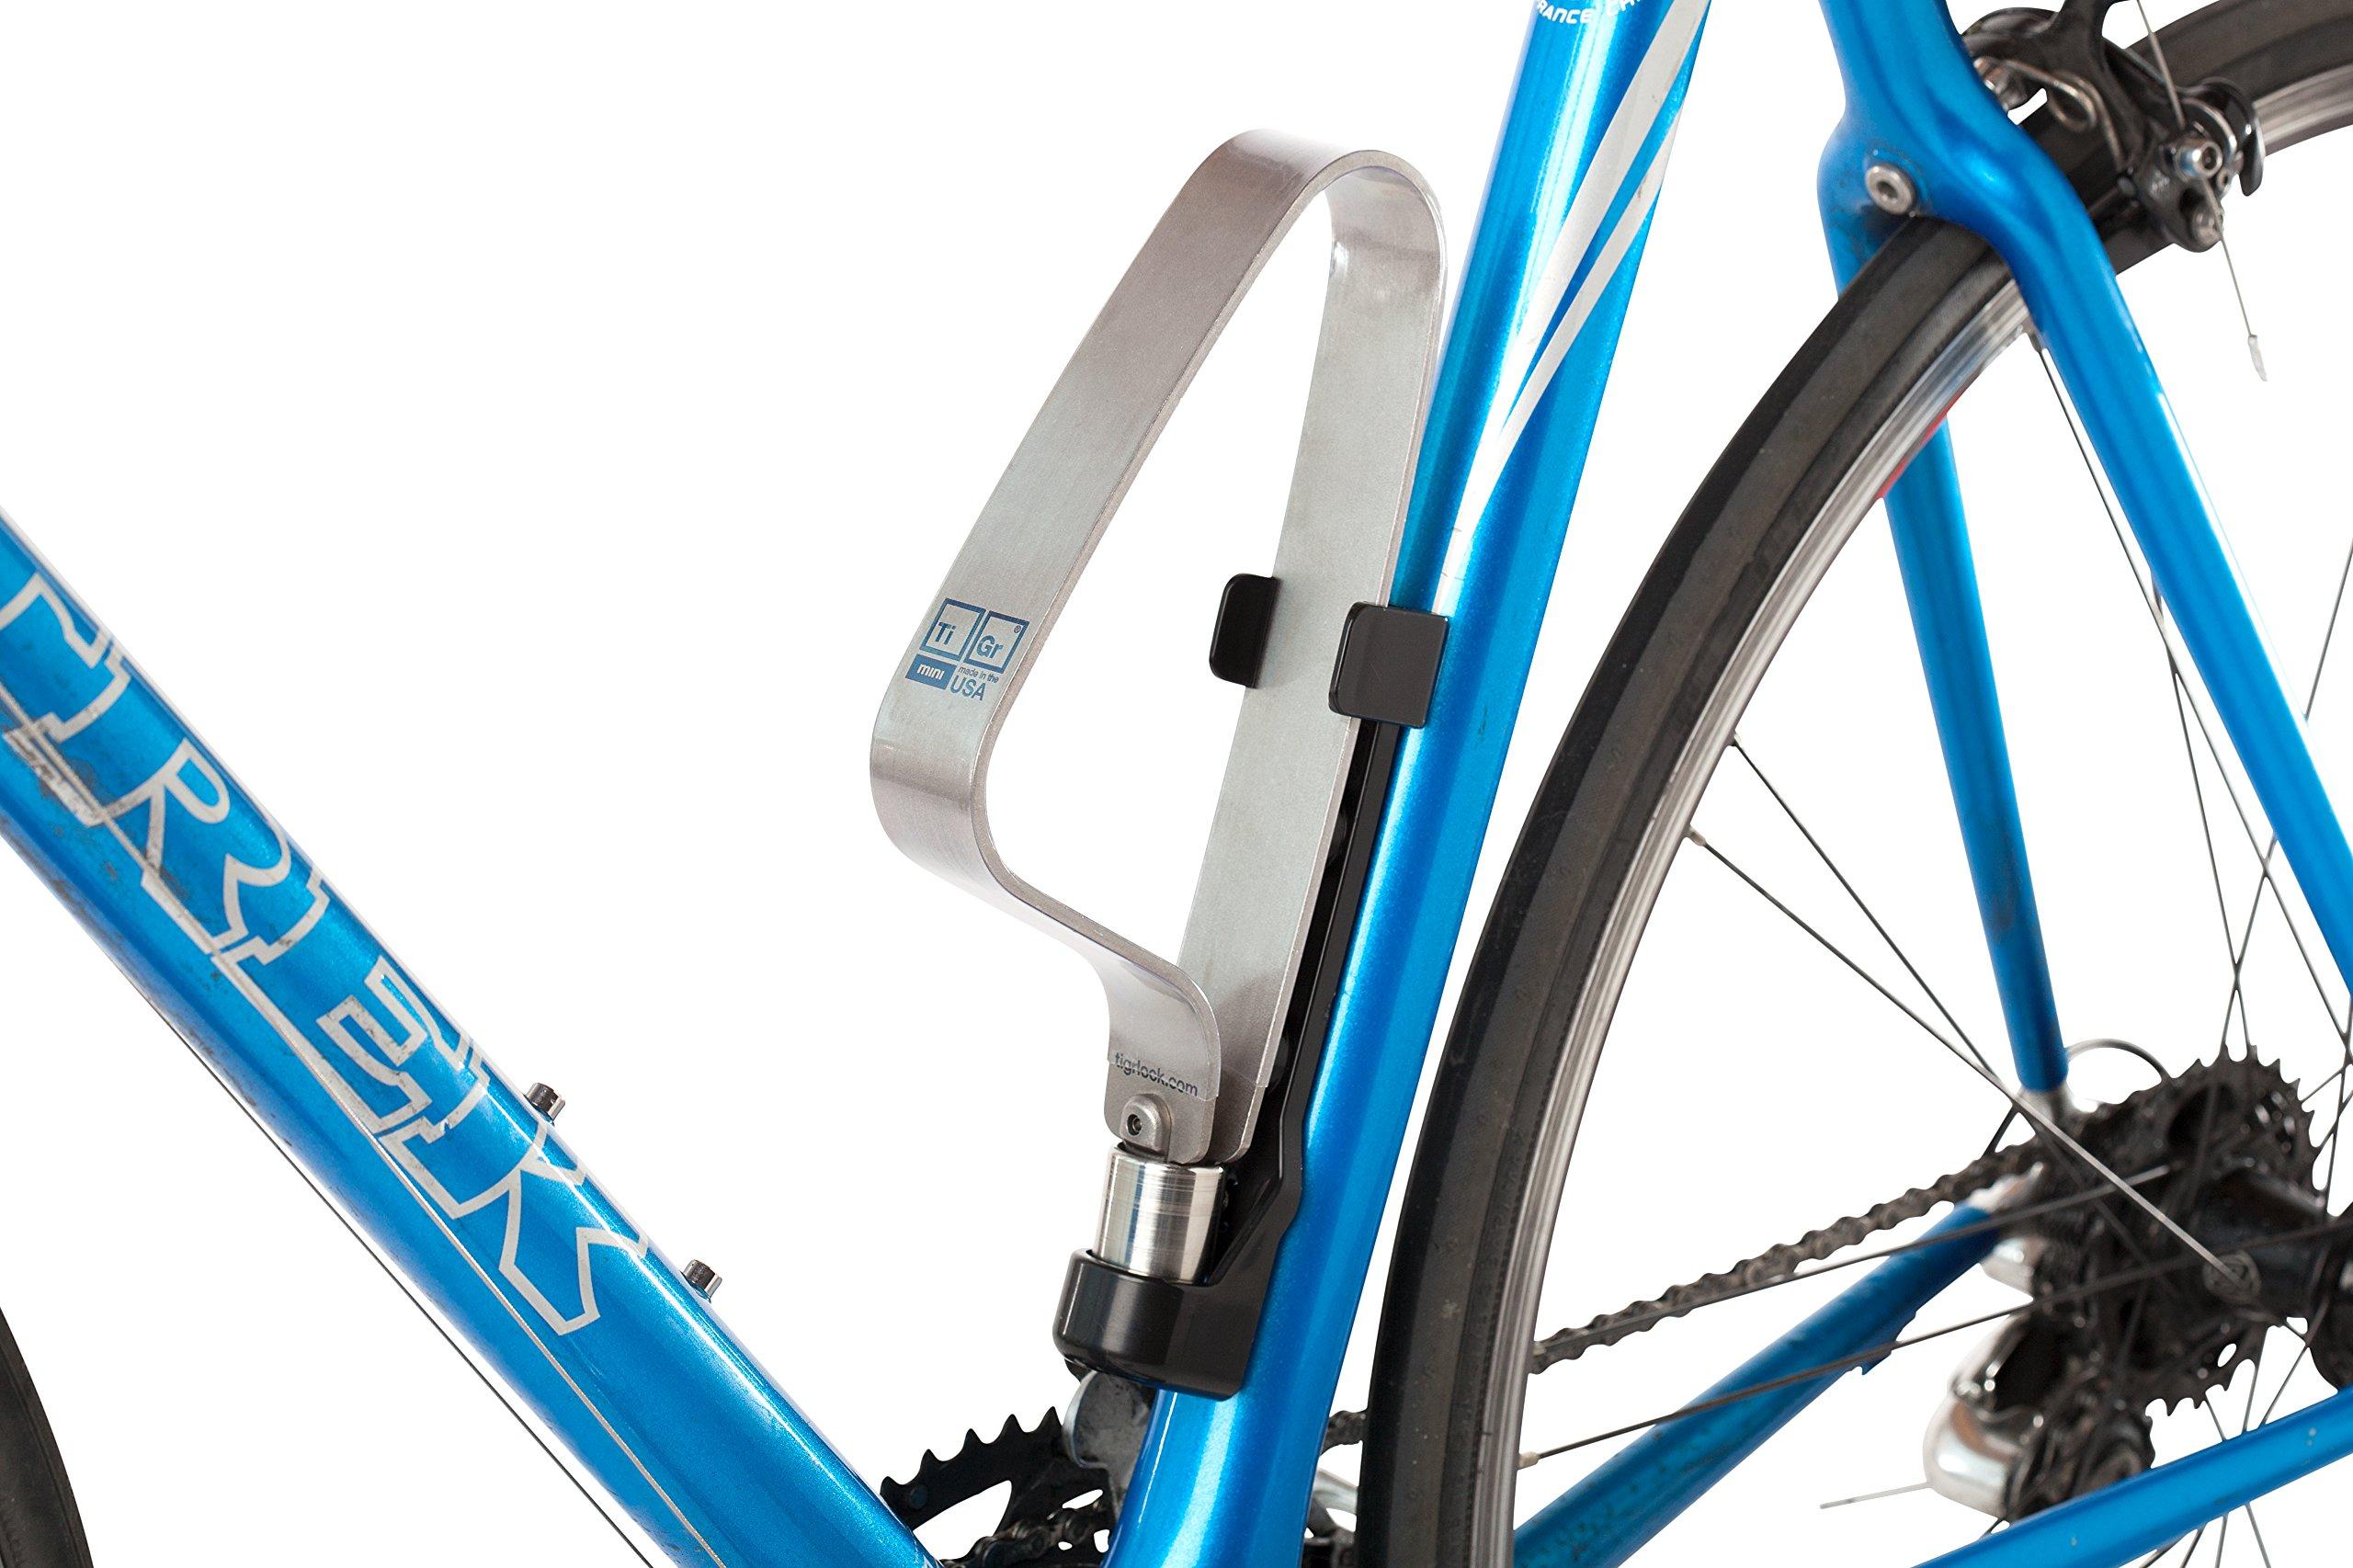 TIGR mini Lightweight Titanium Bicycle Lock & Mounting Clip by TIGR (Image #2)